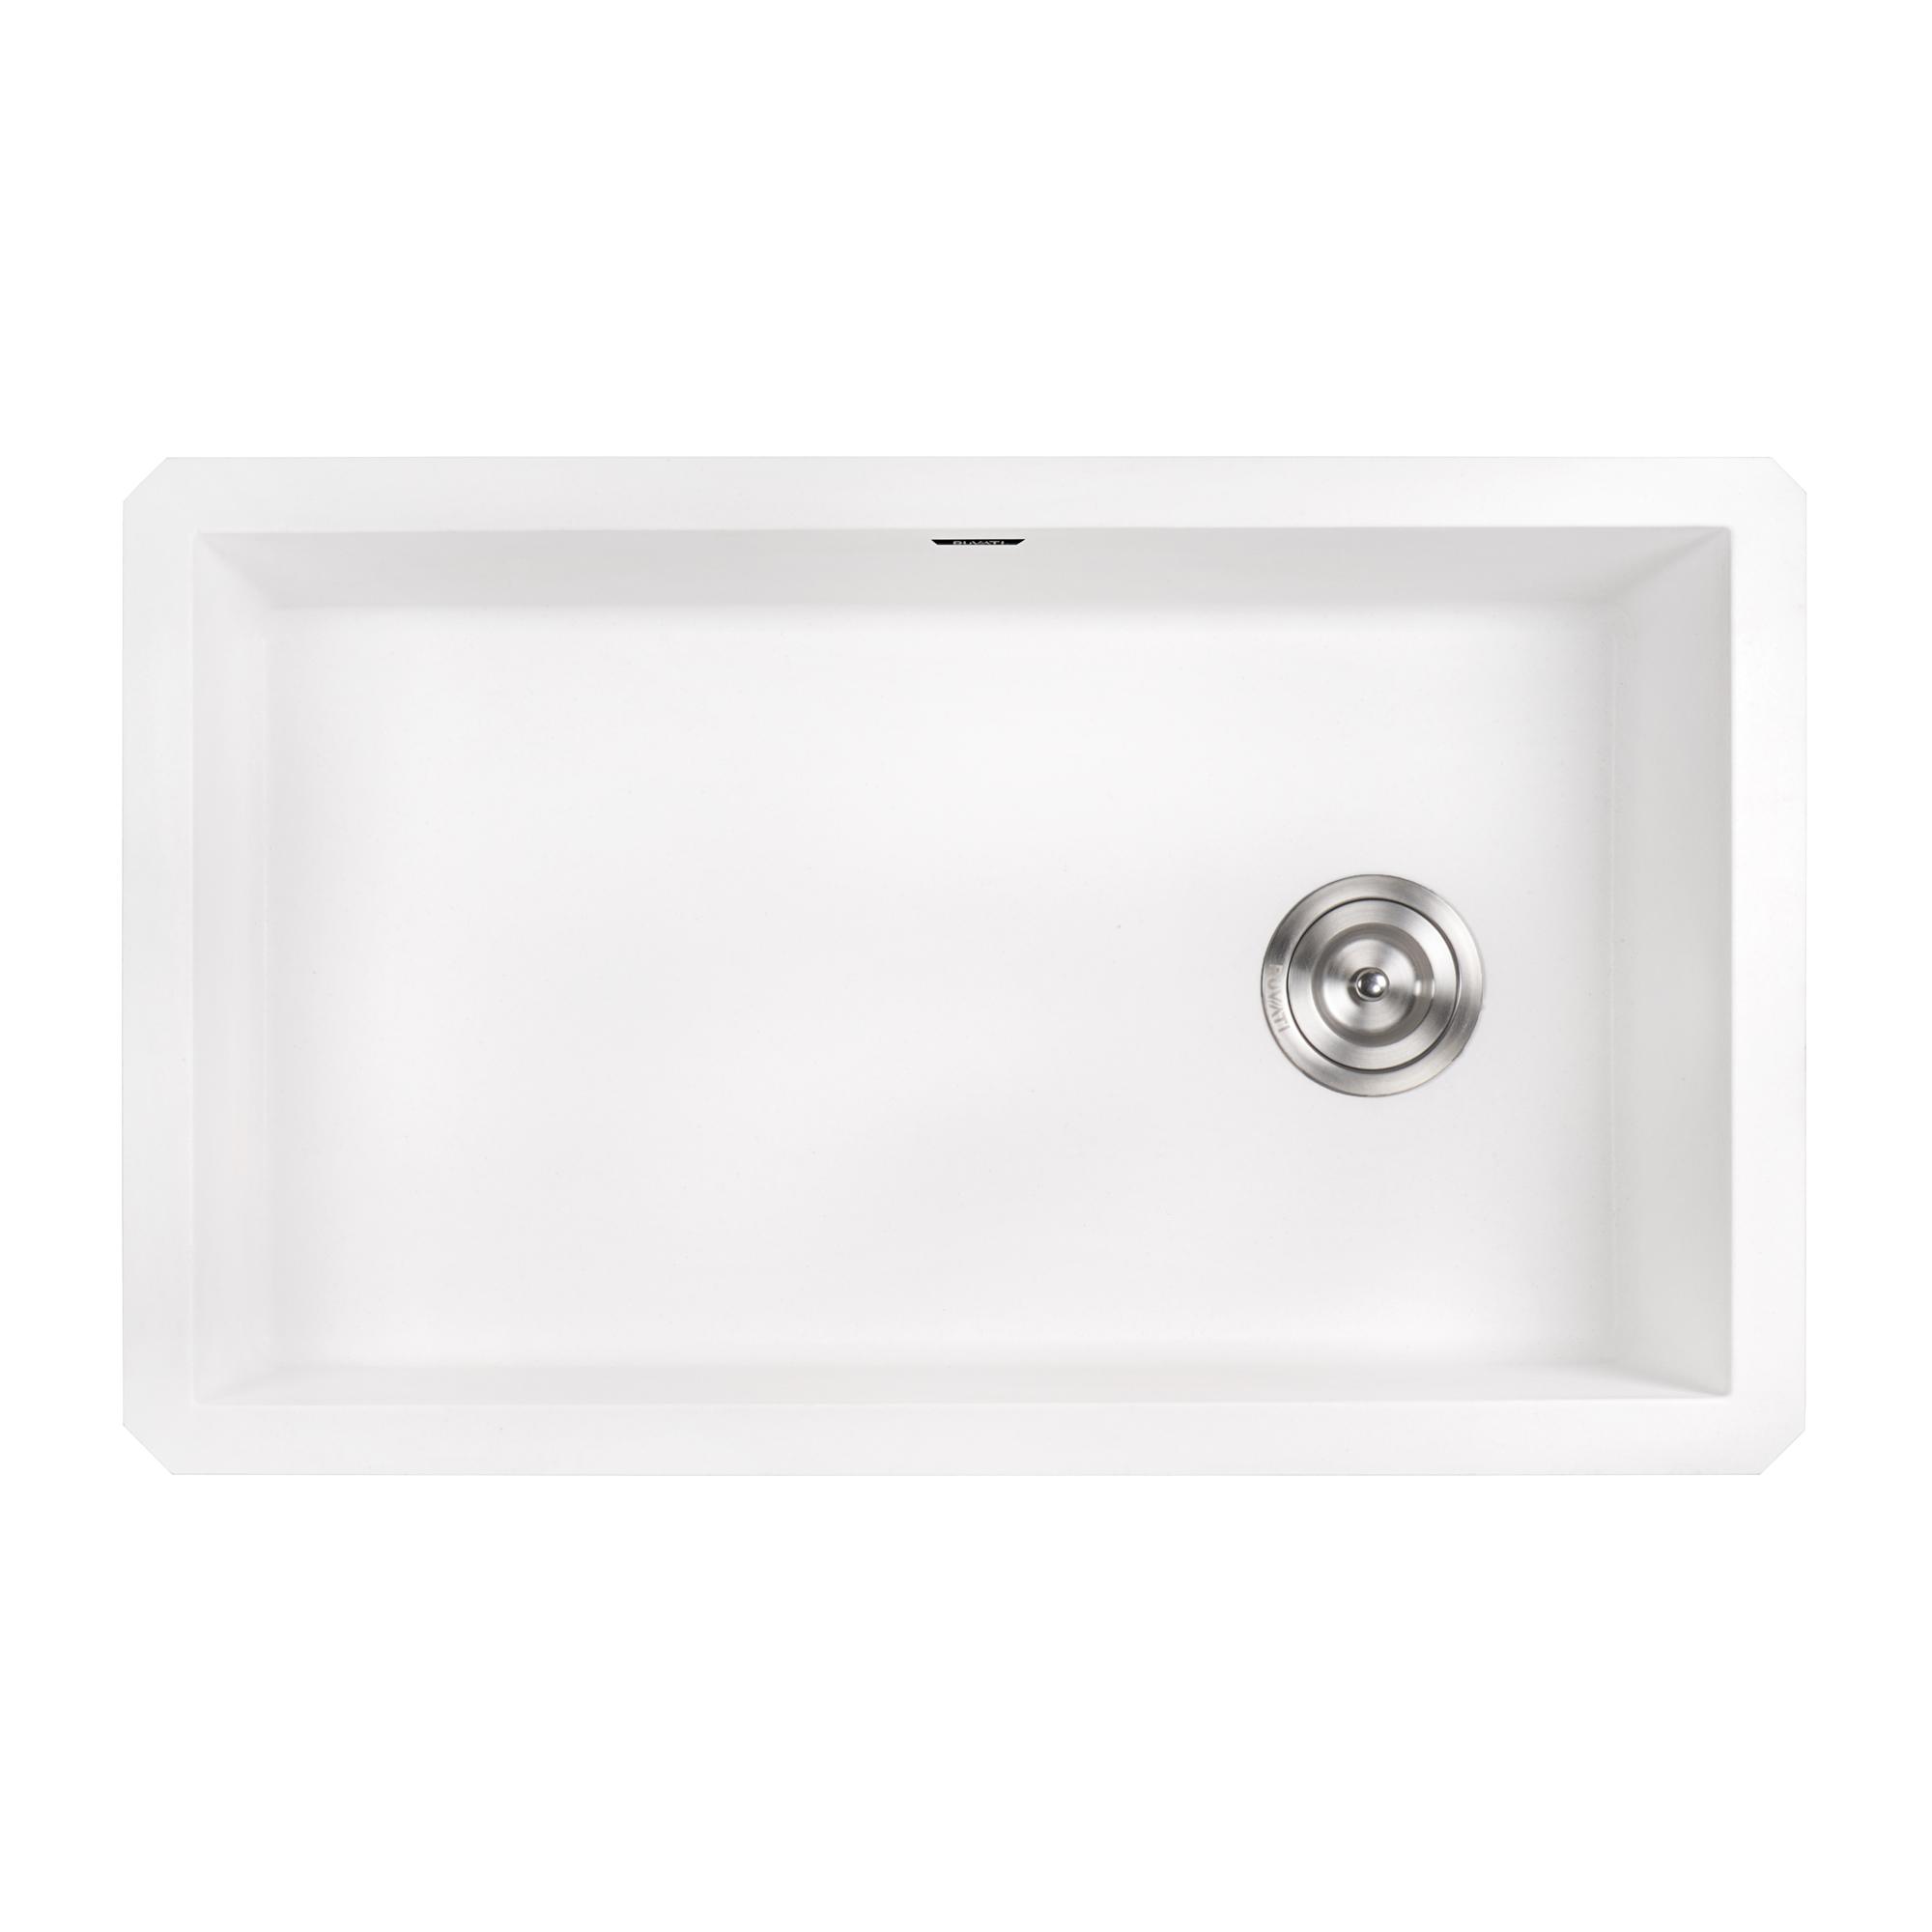 ruvati 31 x 19 inch epigranite undermount granite composite single bowl kitchen sink arctic white rvg2033wh